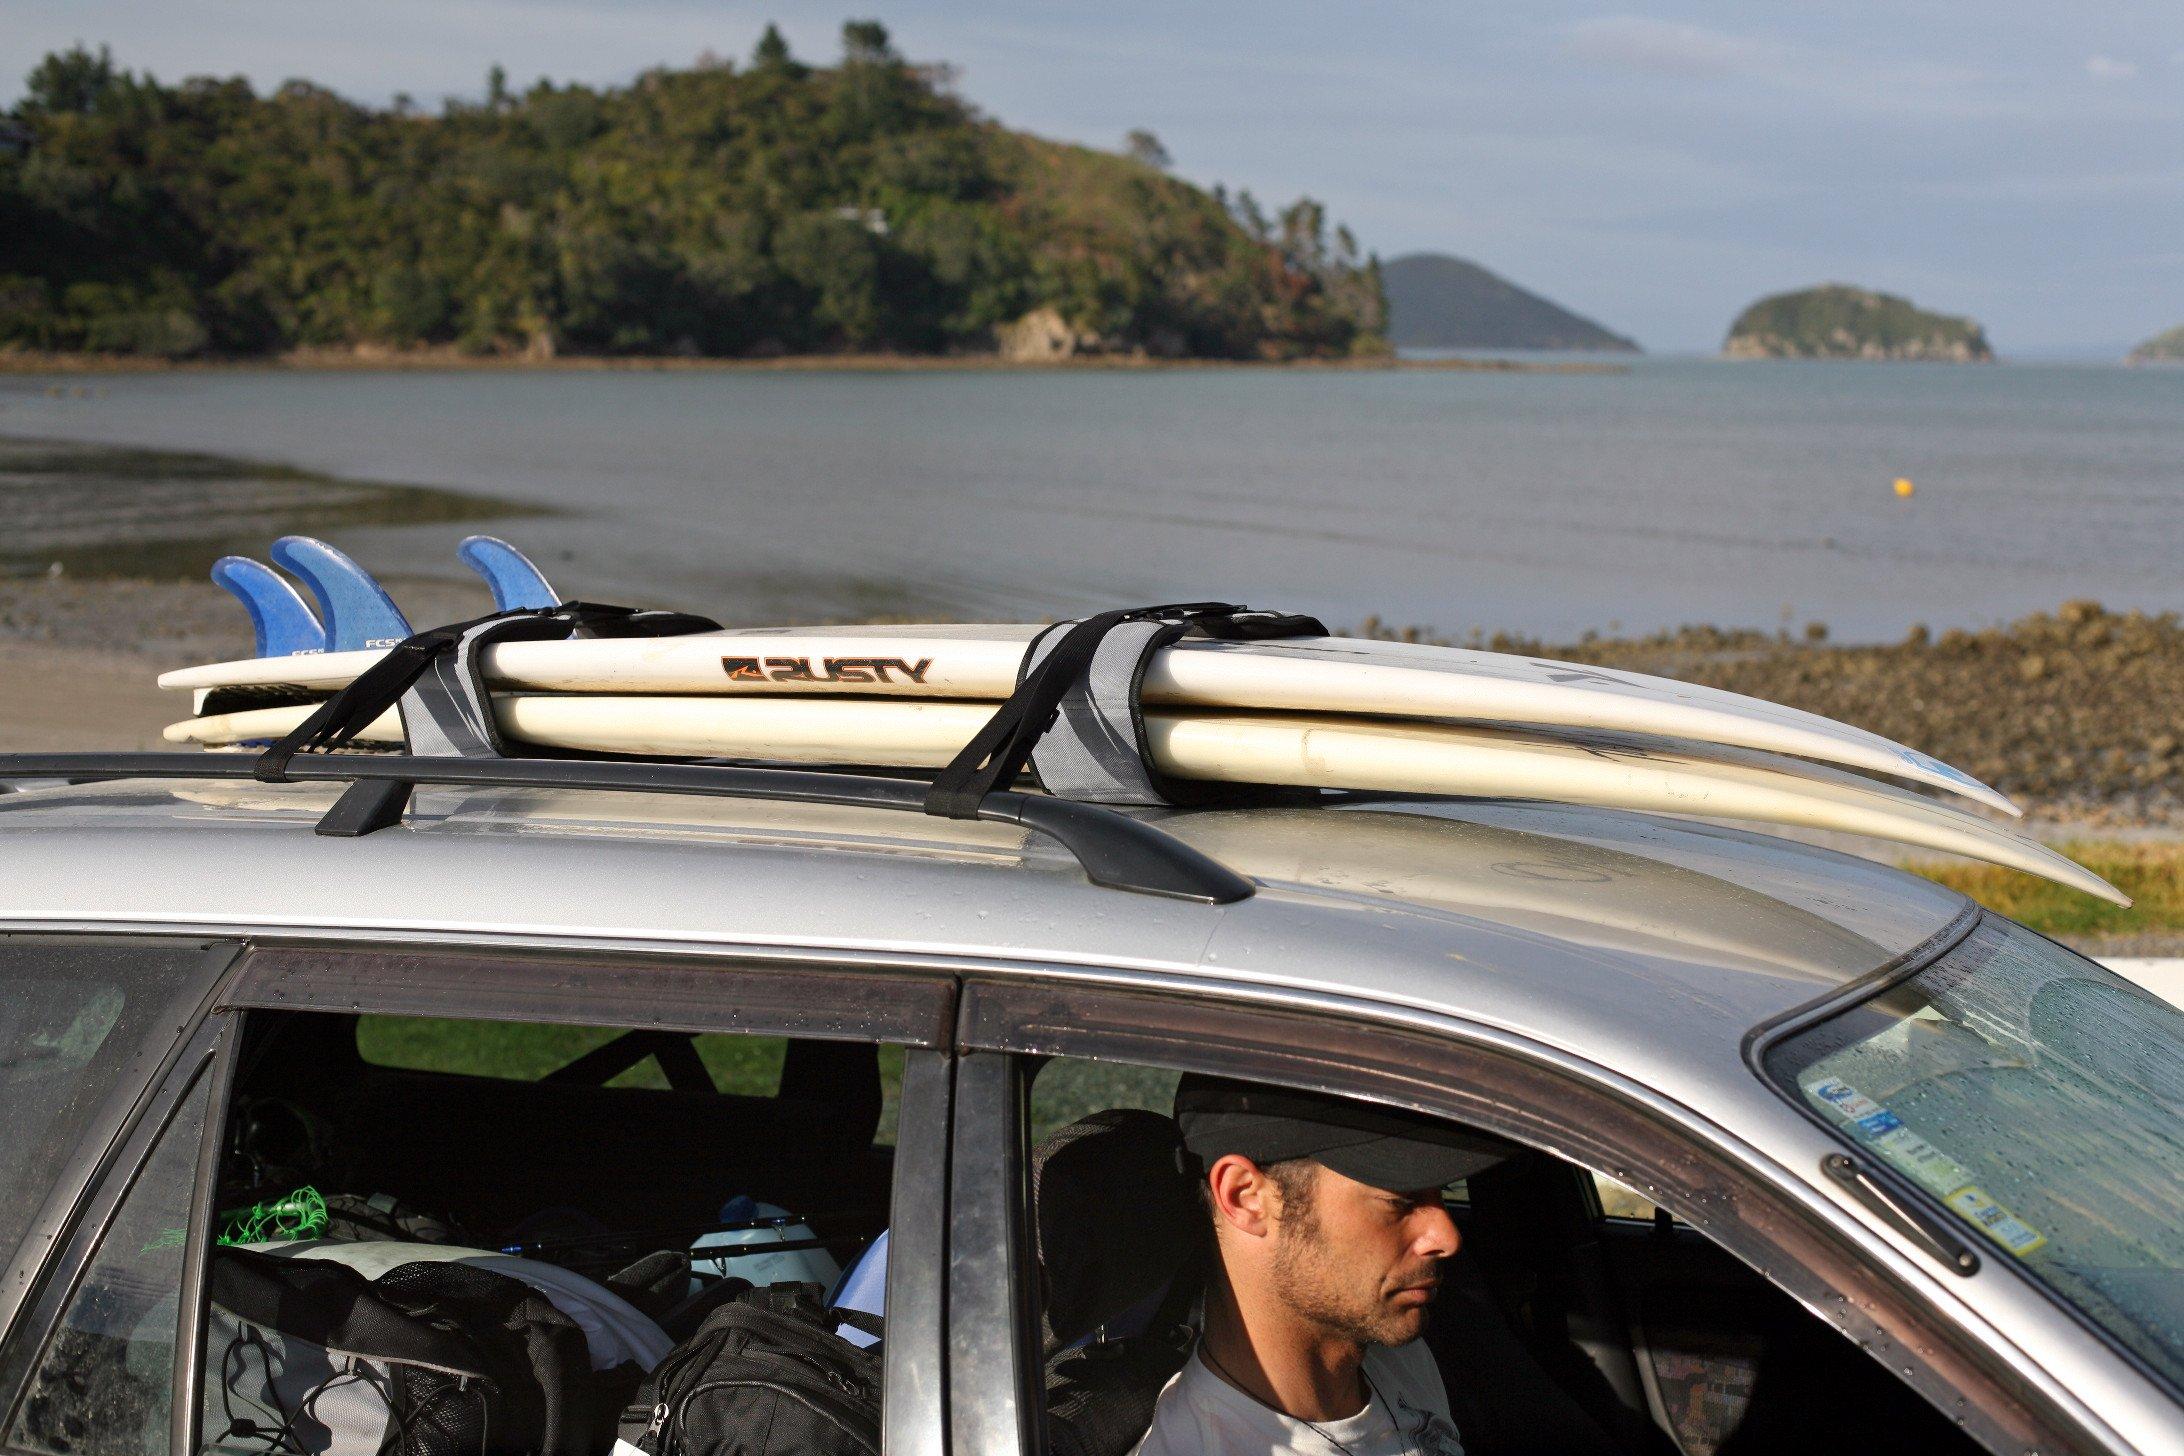 Surfboard Soft Rack LOCKDOWN Premium Surfboard Car Racks by Curve (set of 2) by Curve (Image #5)